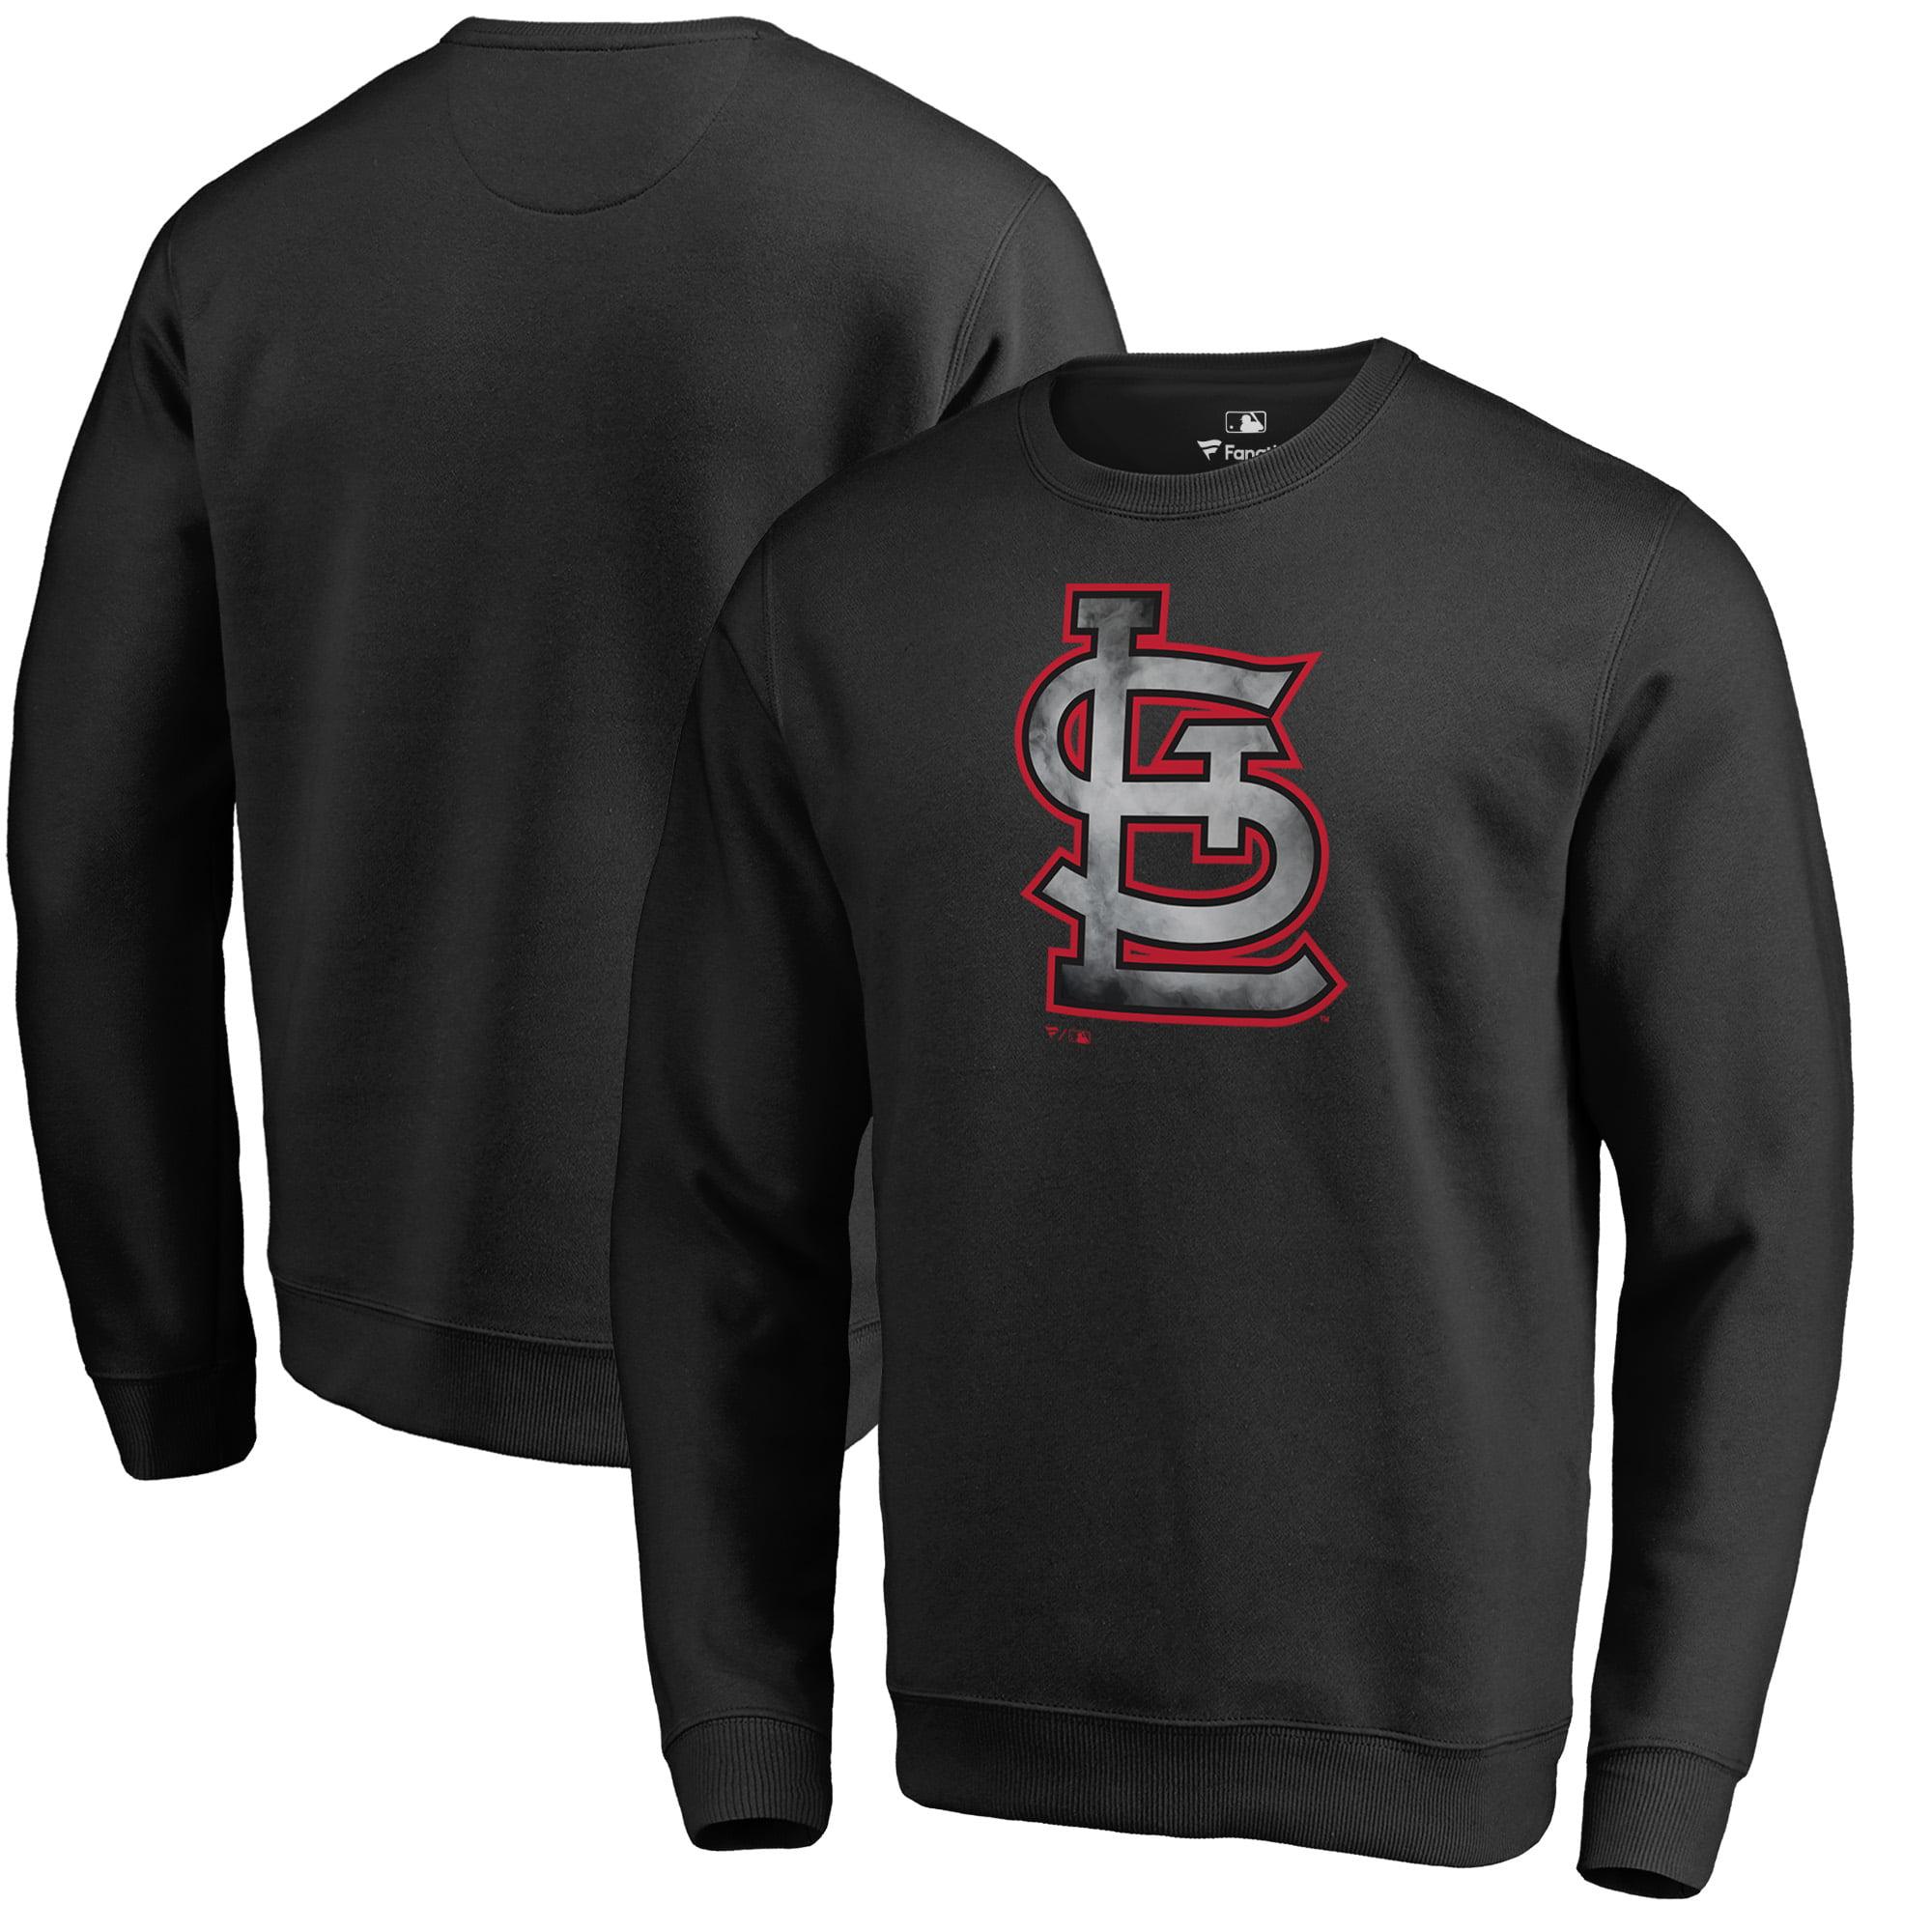 St. Louis Cardinals Fanatics Branded Core Smoke Fleece Sweatshirt - Black